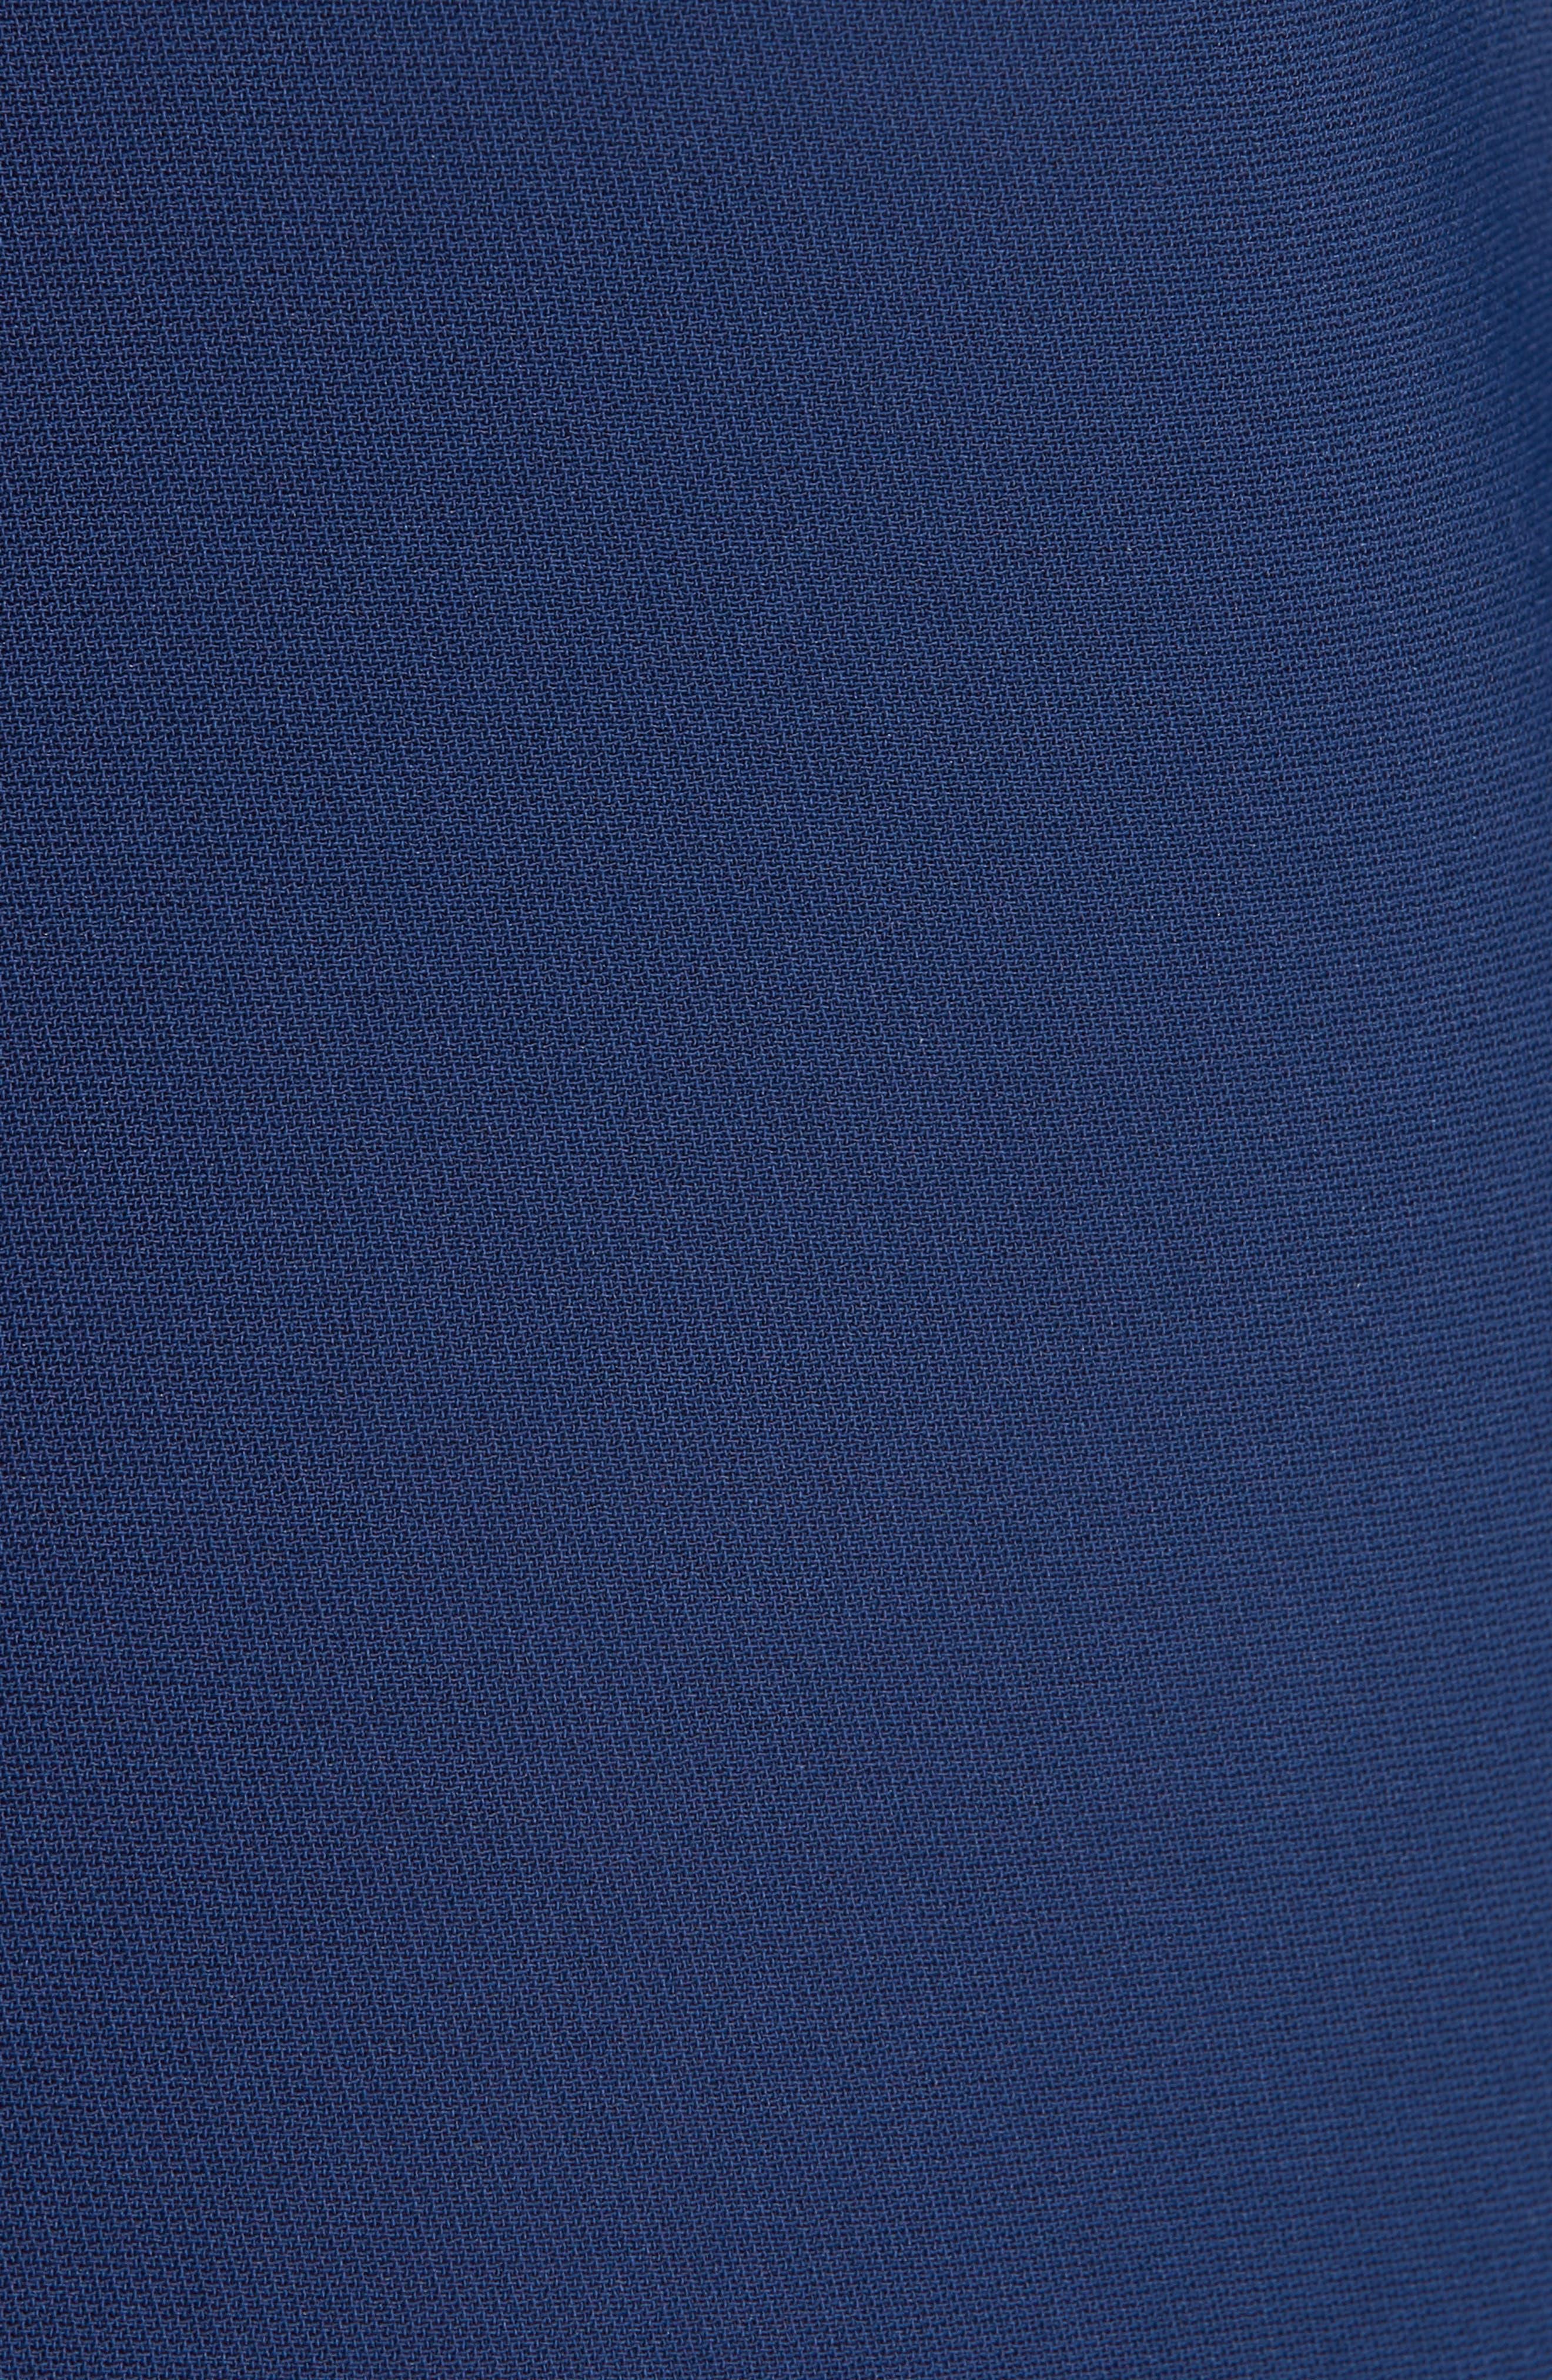 Kilkenny Frill Sleeve Minidress,                             Alternate thumbnail 5, color,                             400